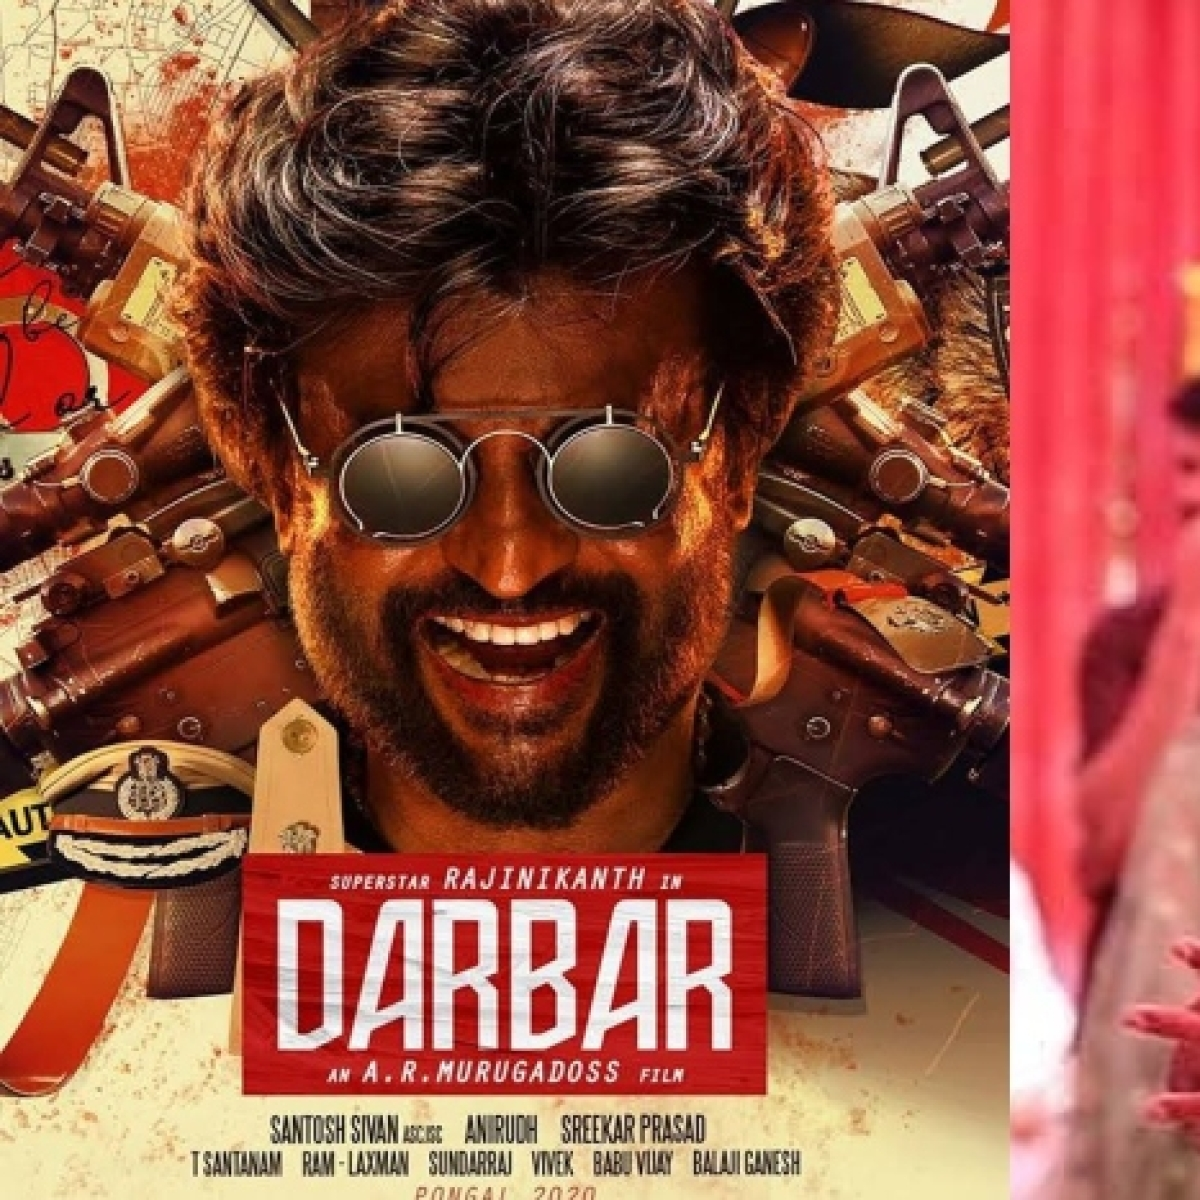 Rajnikanth's 'Darbar' challenge to 'Tanhaji' and 'Chhapaak'